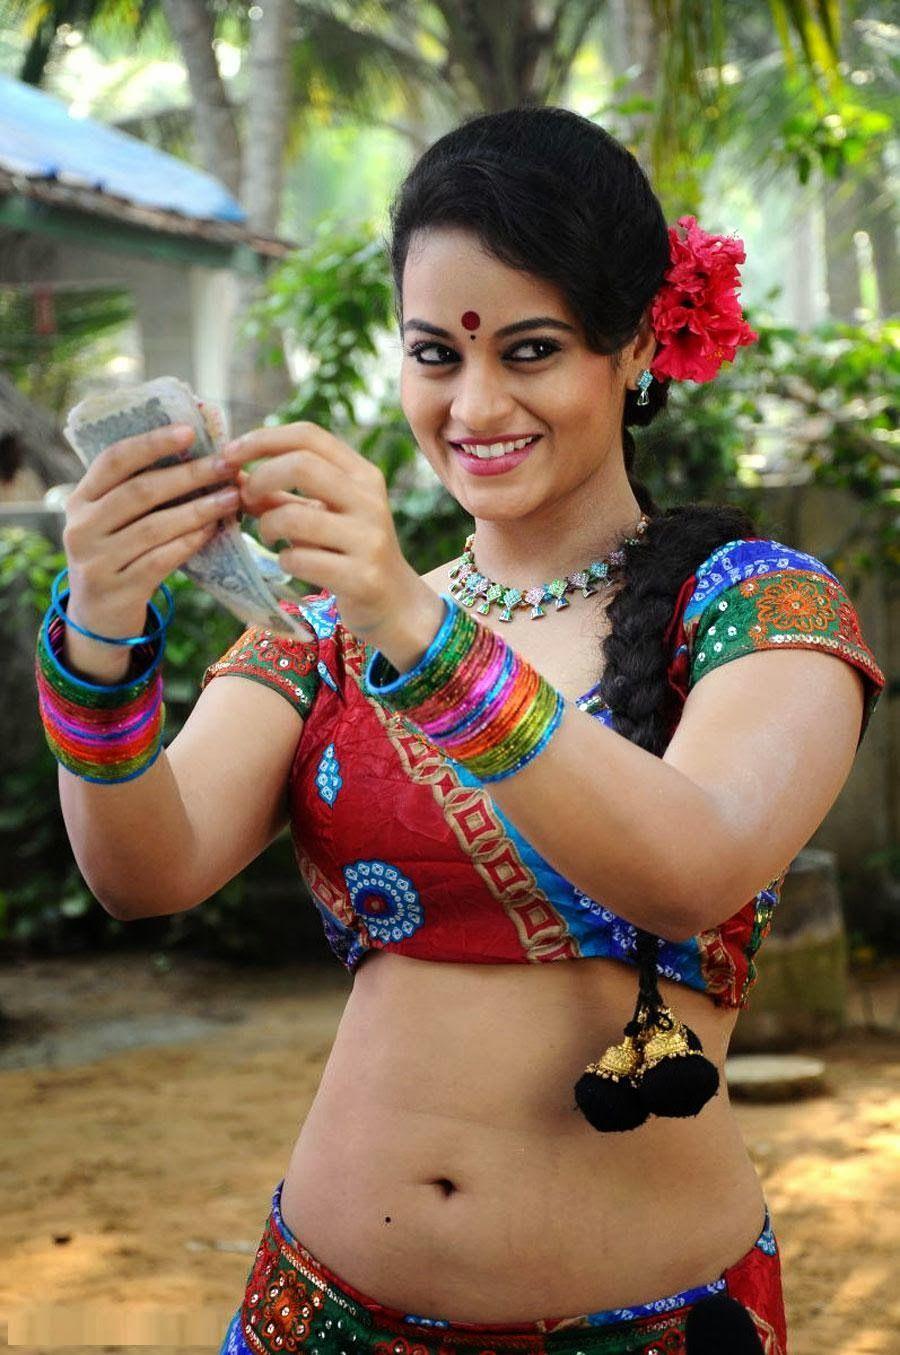 best of Male Hot models amateur indian